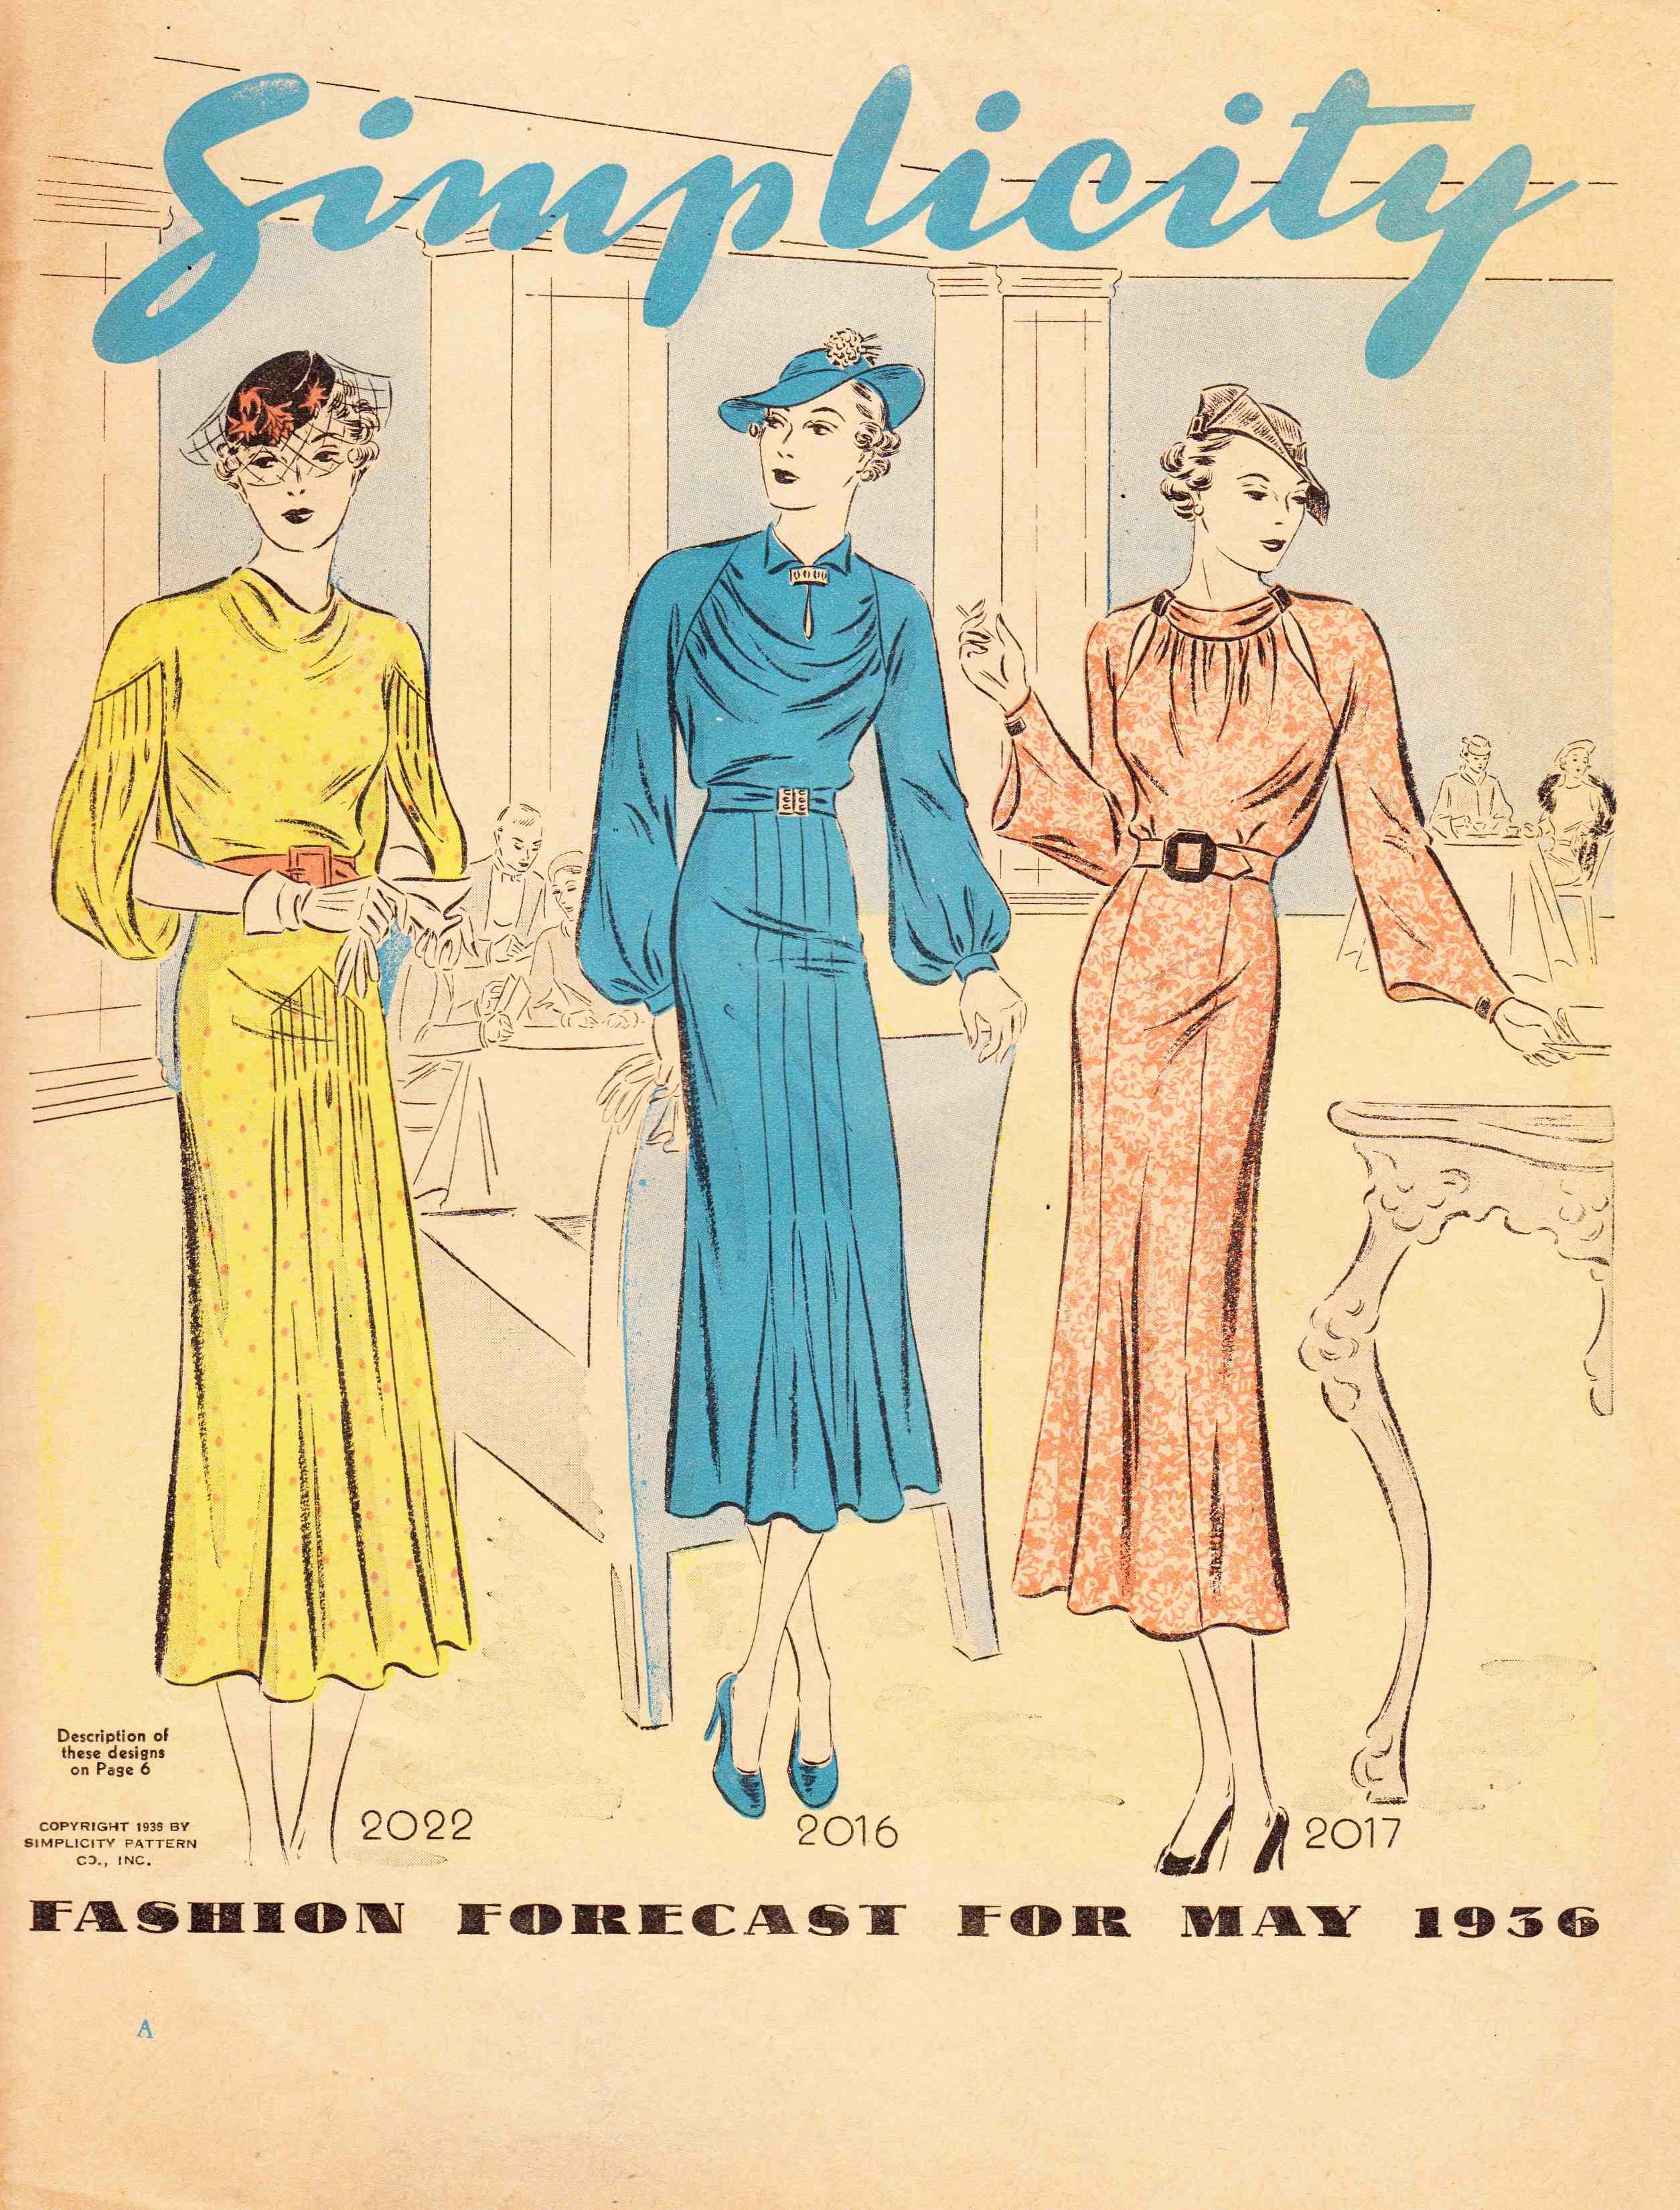 Simplicity Fashion Forecast May 1936